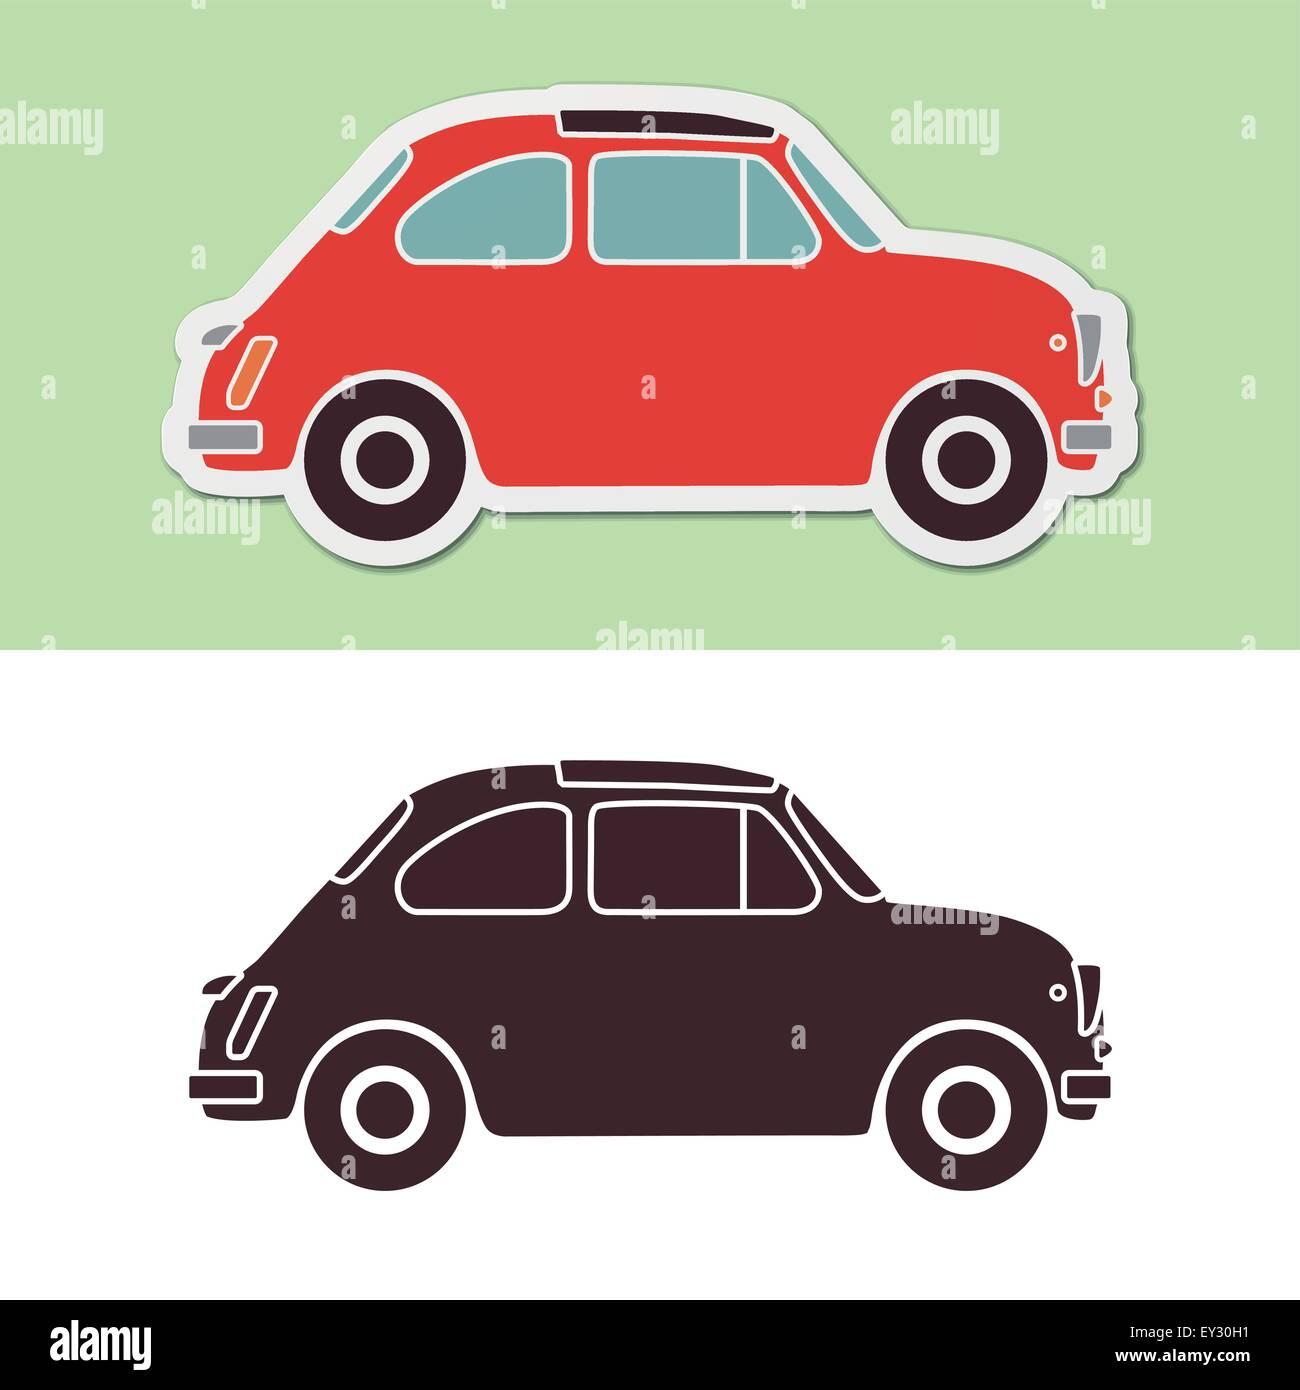 Old fashion Italian car - Stock Image